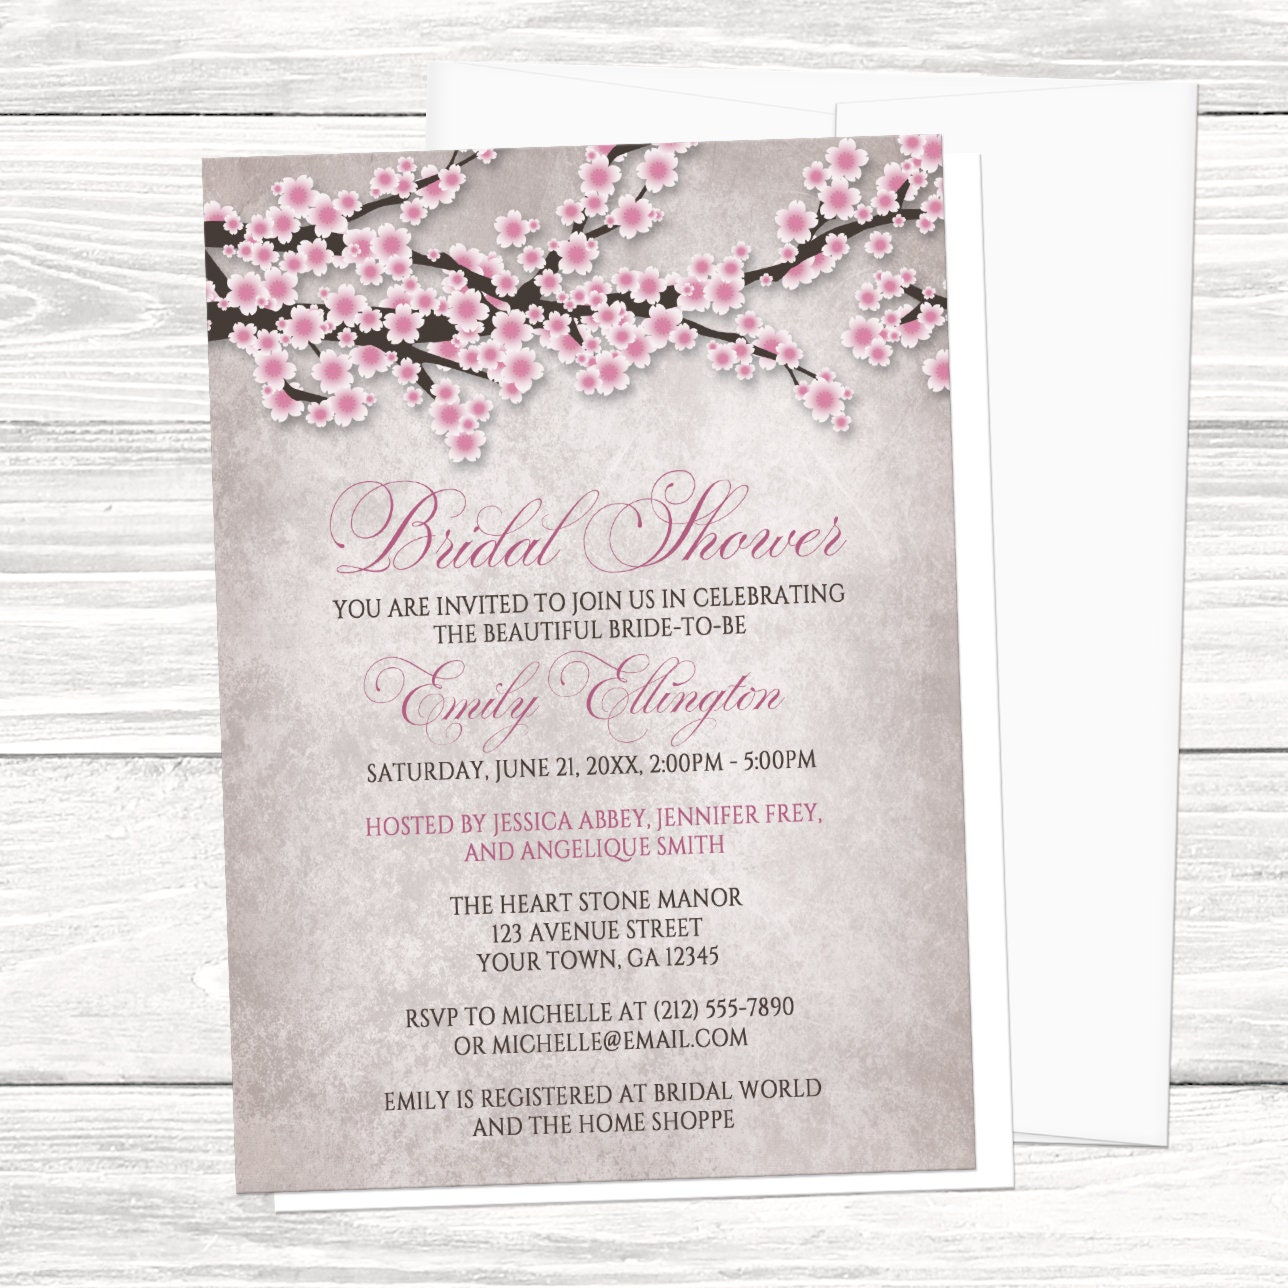 fdb7ff5a2f49 Cherry Blossom Bridal Shower Invitations Rustic Pink